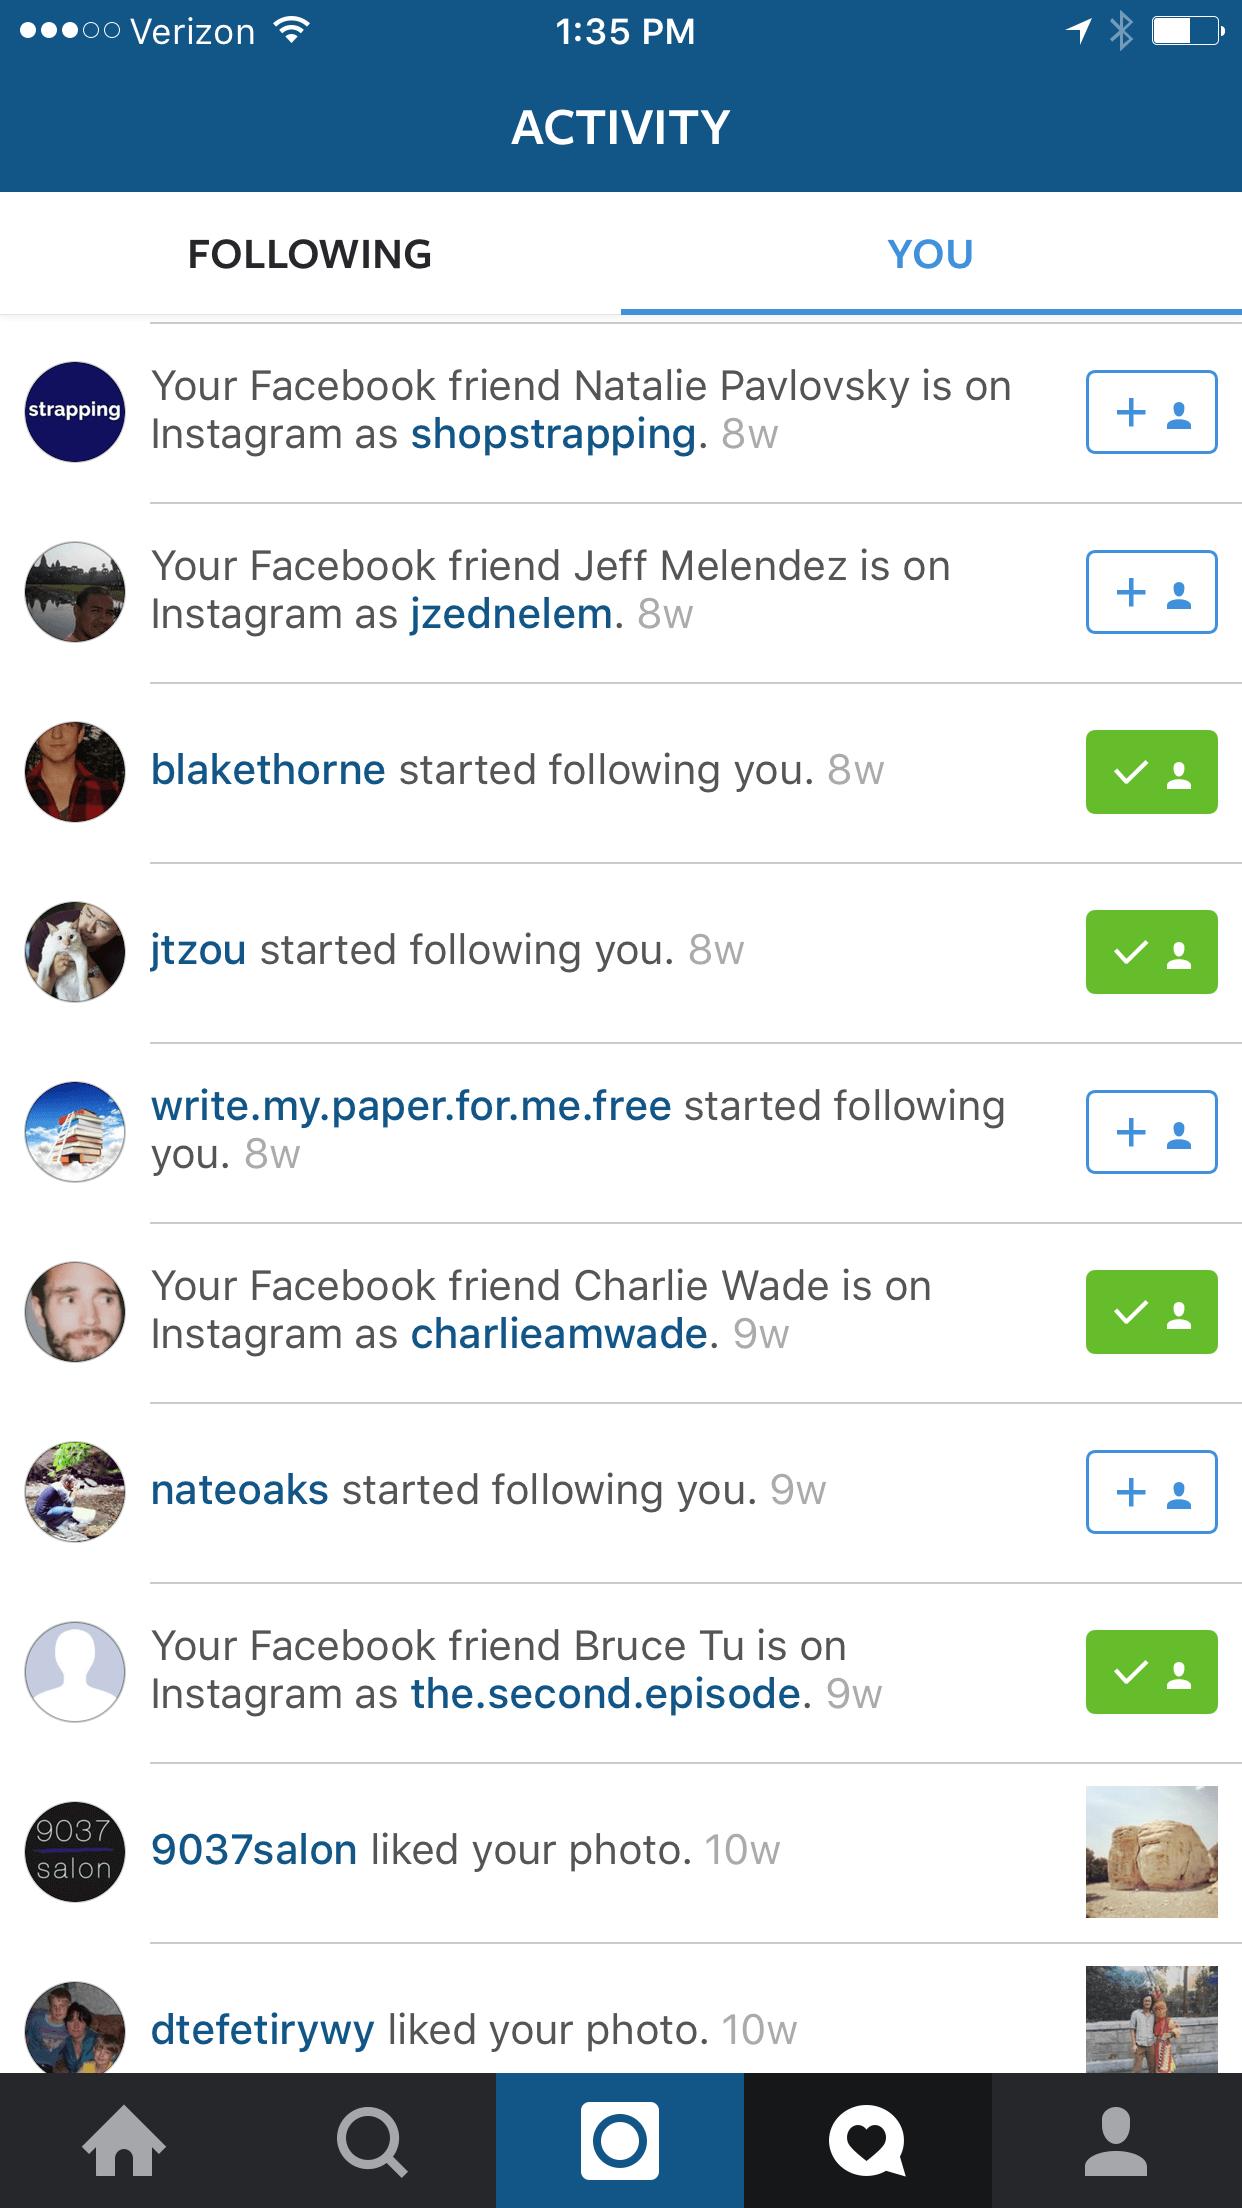 Instagram Notifications based on Social Profiles